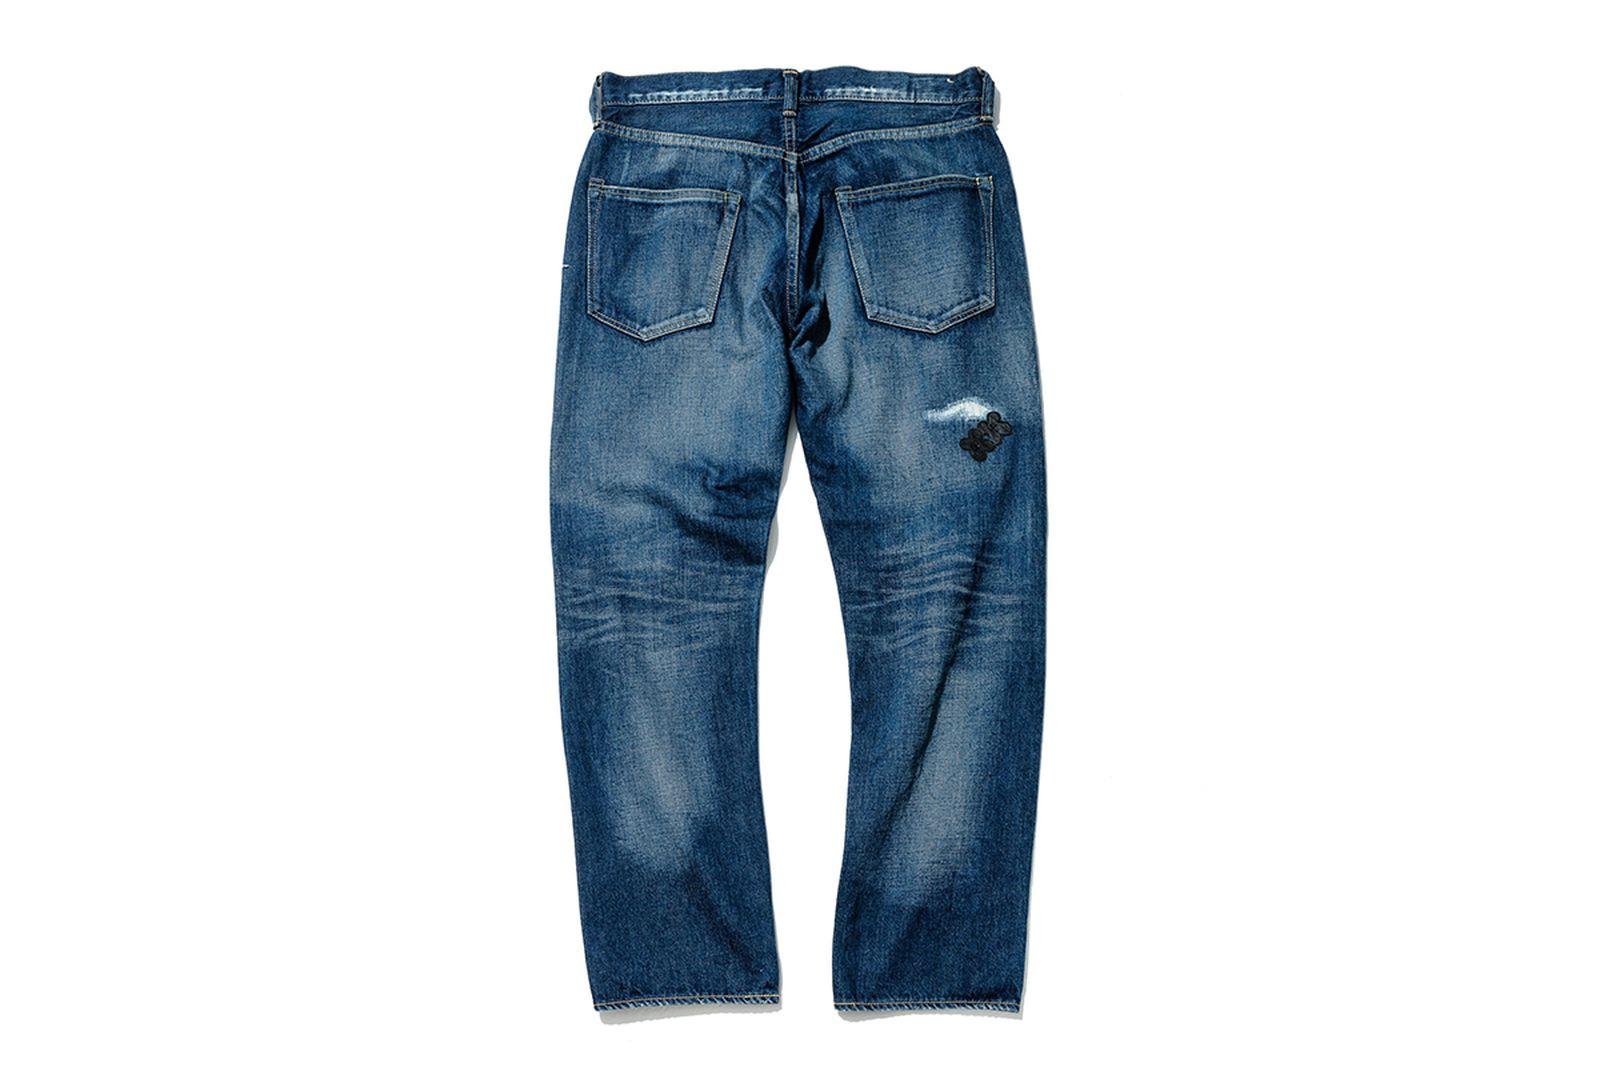 bru-na-boinne-leather-patch-jeans- (3)